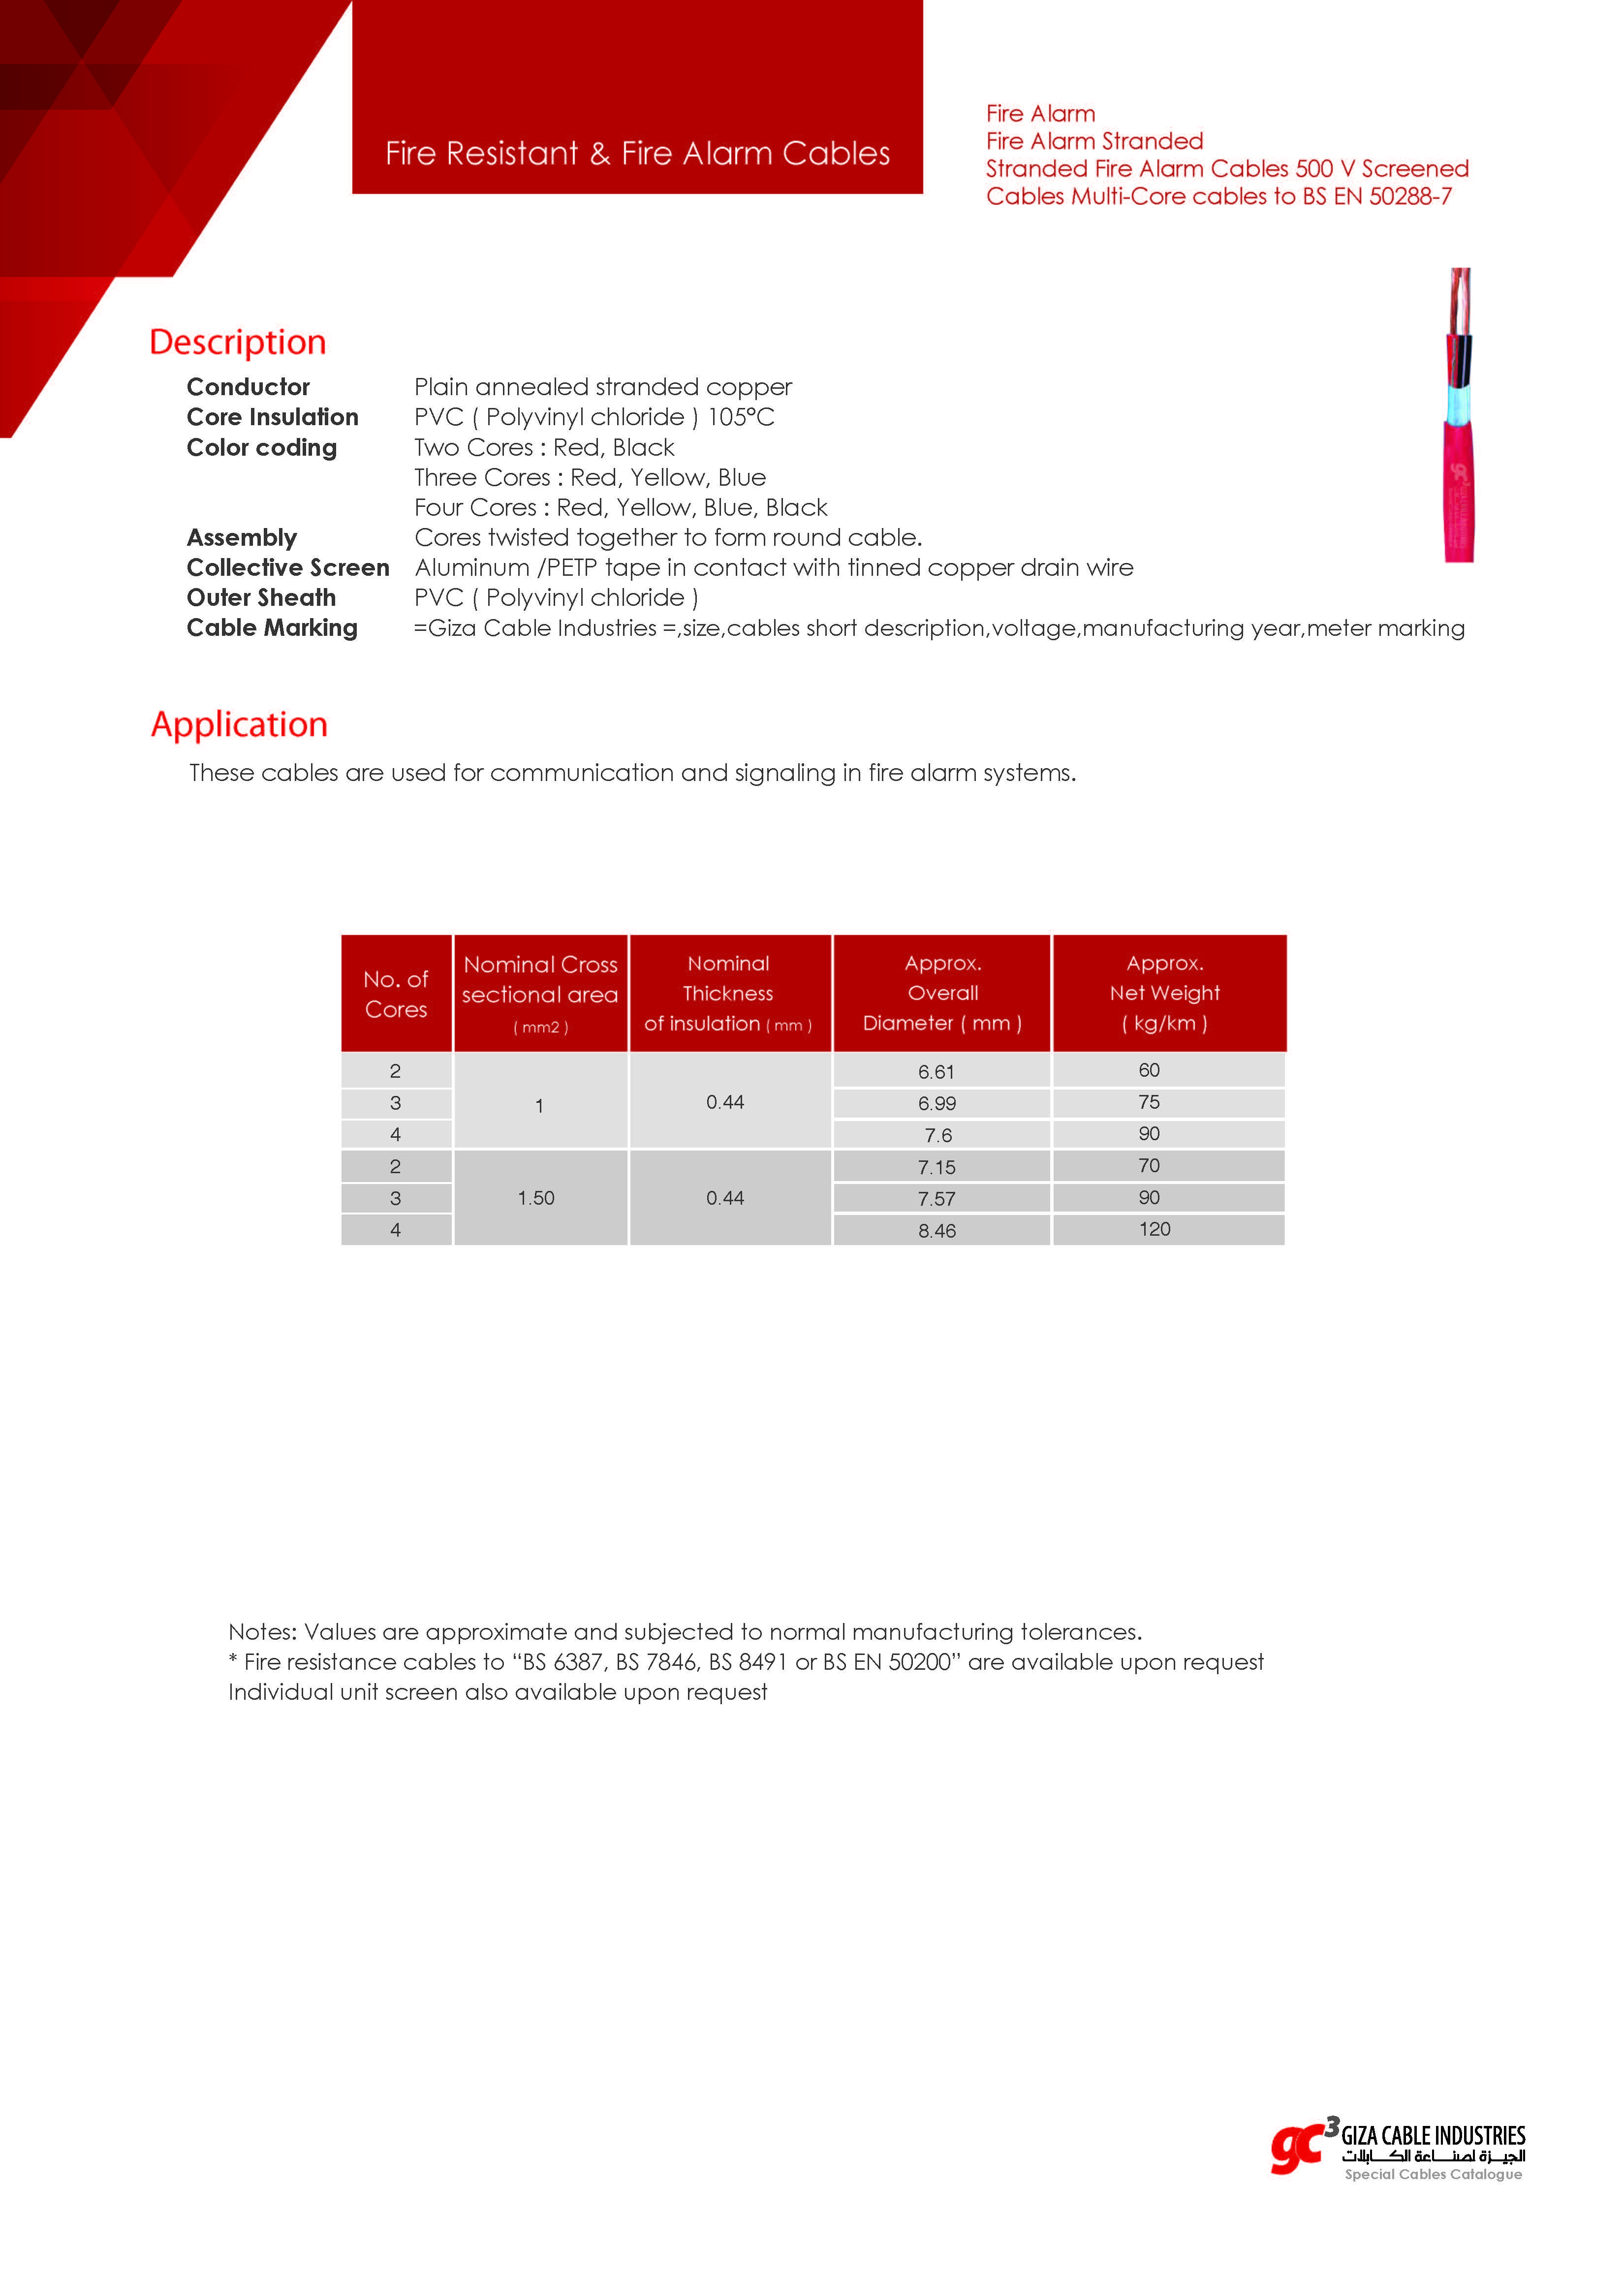 Fire Resistant & Fire Alarm Cables